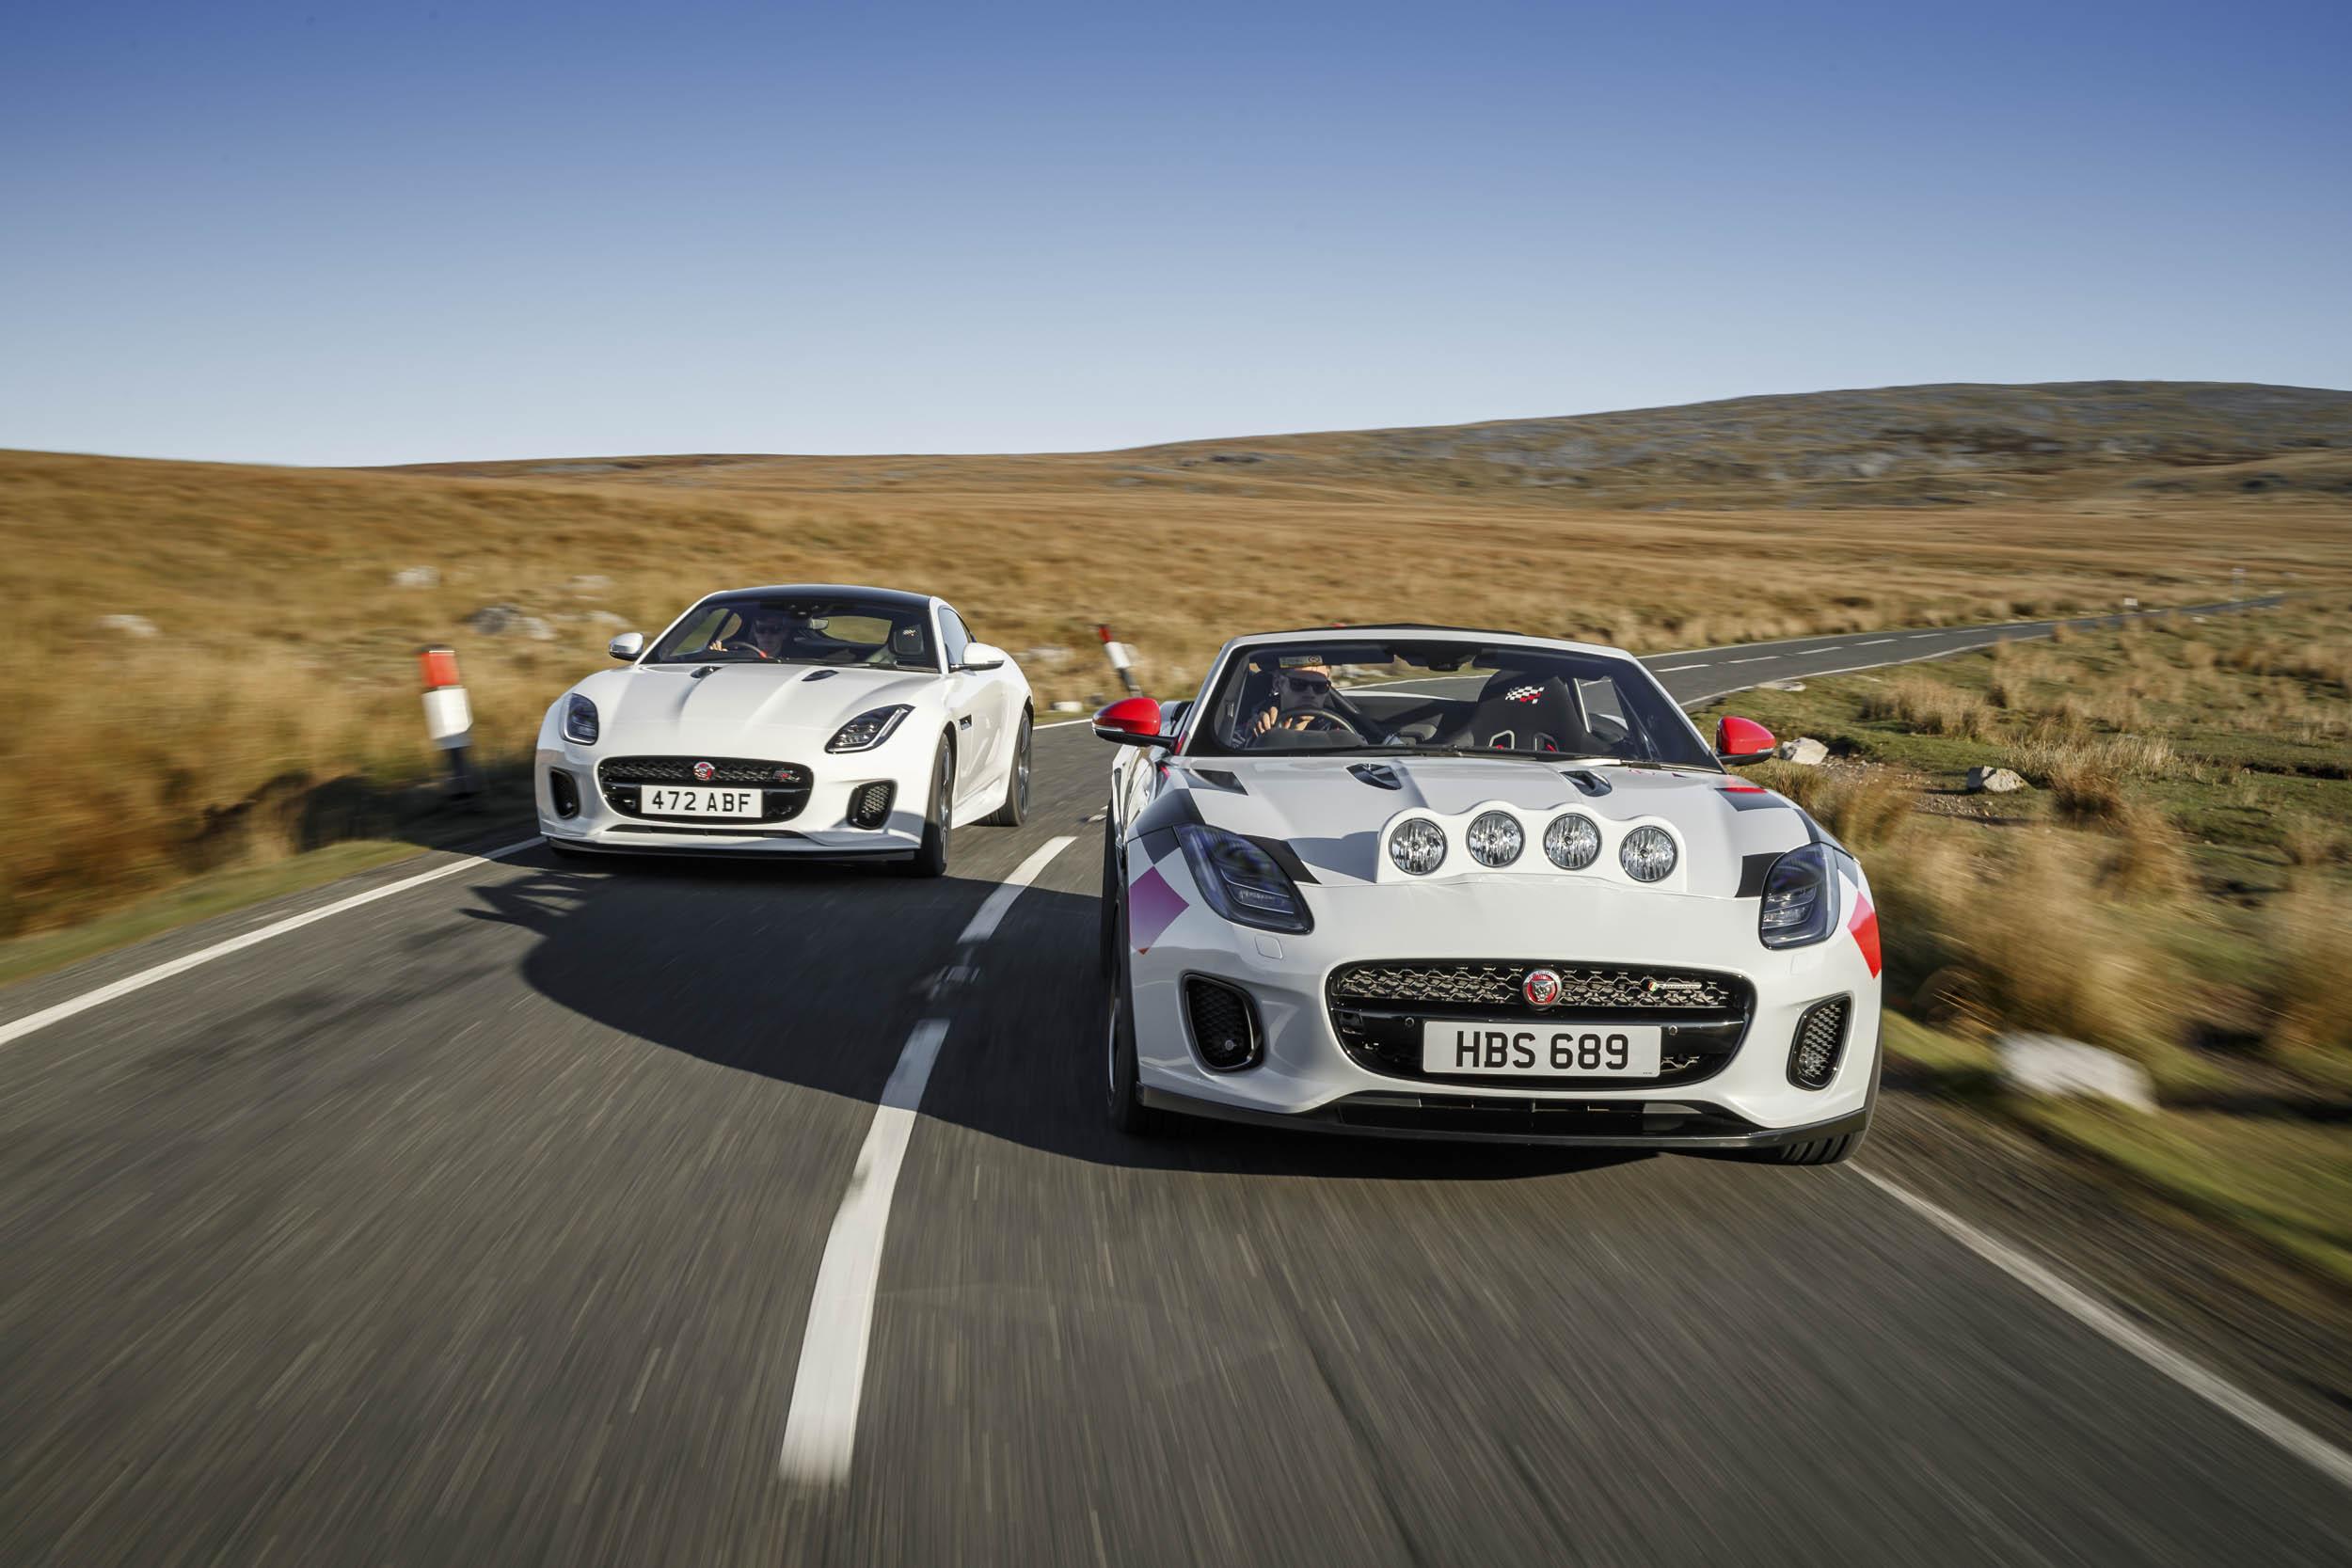 Jaguar F-type convertible rally car driving